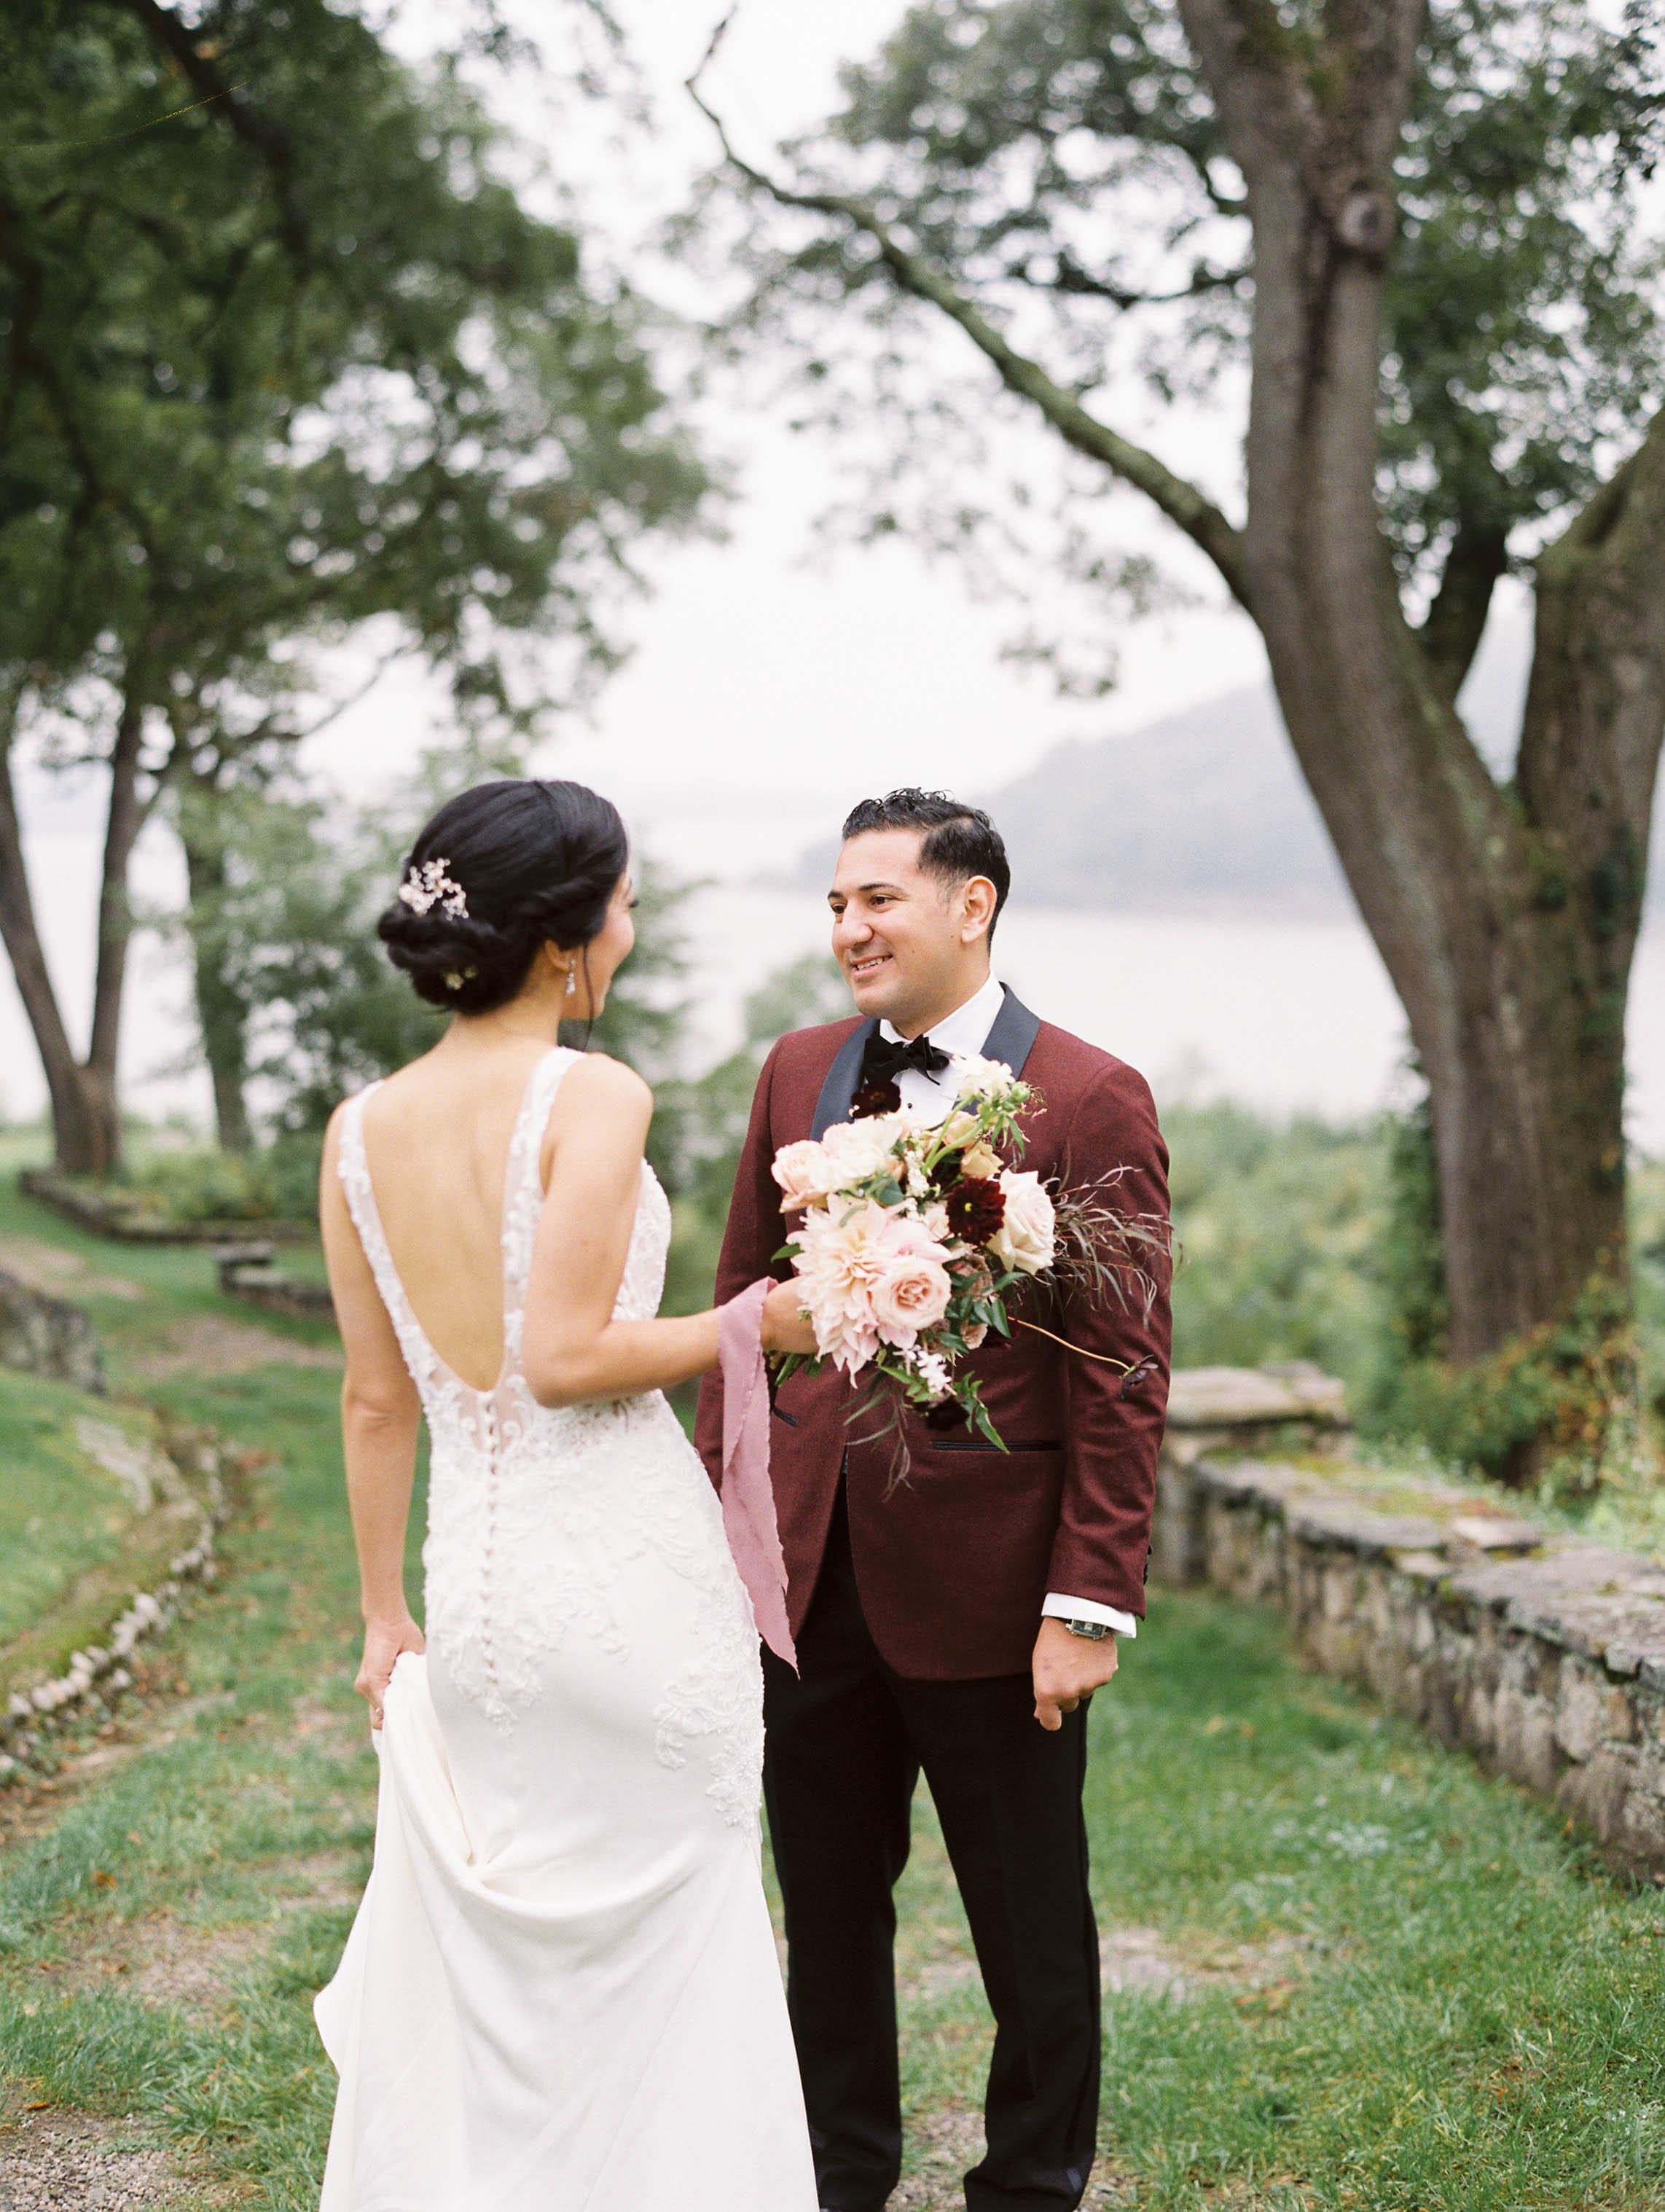 kelsandmichael_weddingphotography_ny-16.jpg